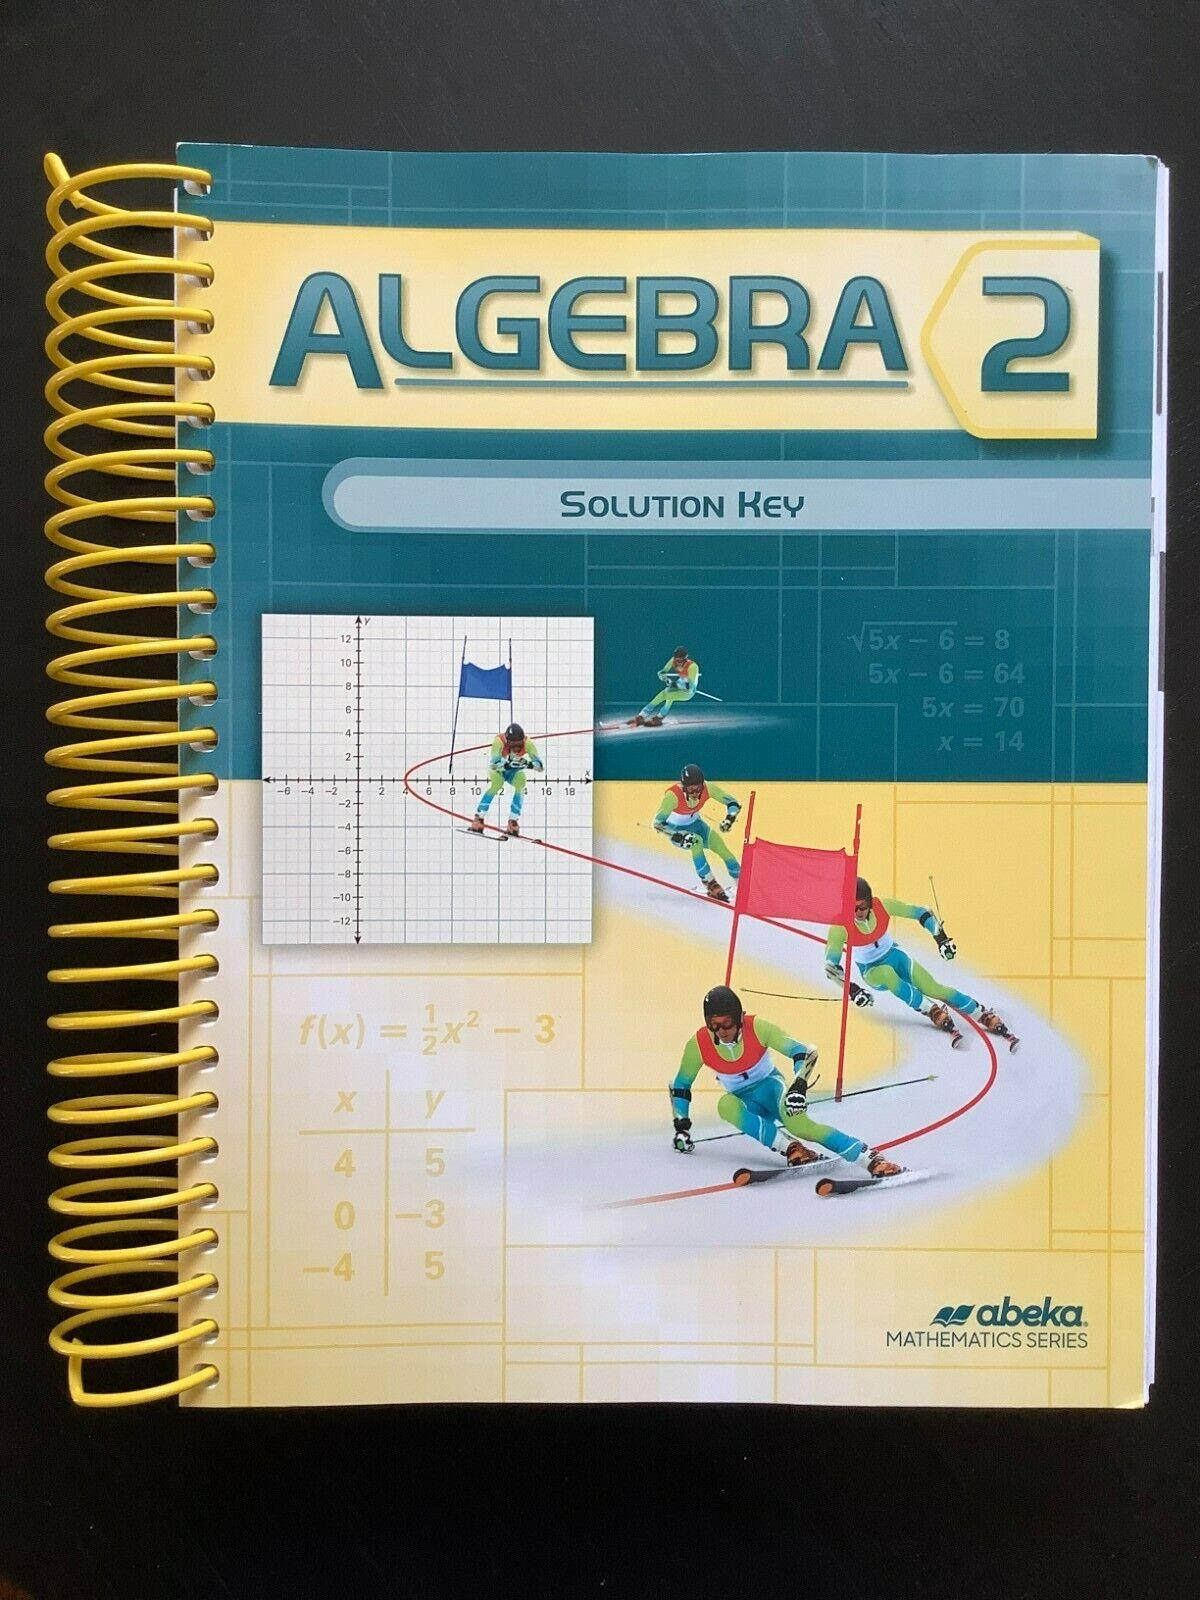 Abeka Algebra 2 Solution Key, Brand New, Current Edition. - $30.00